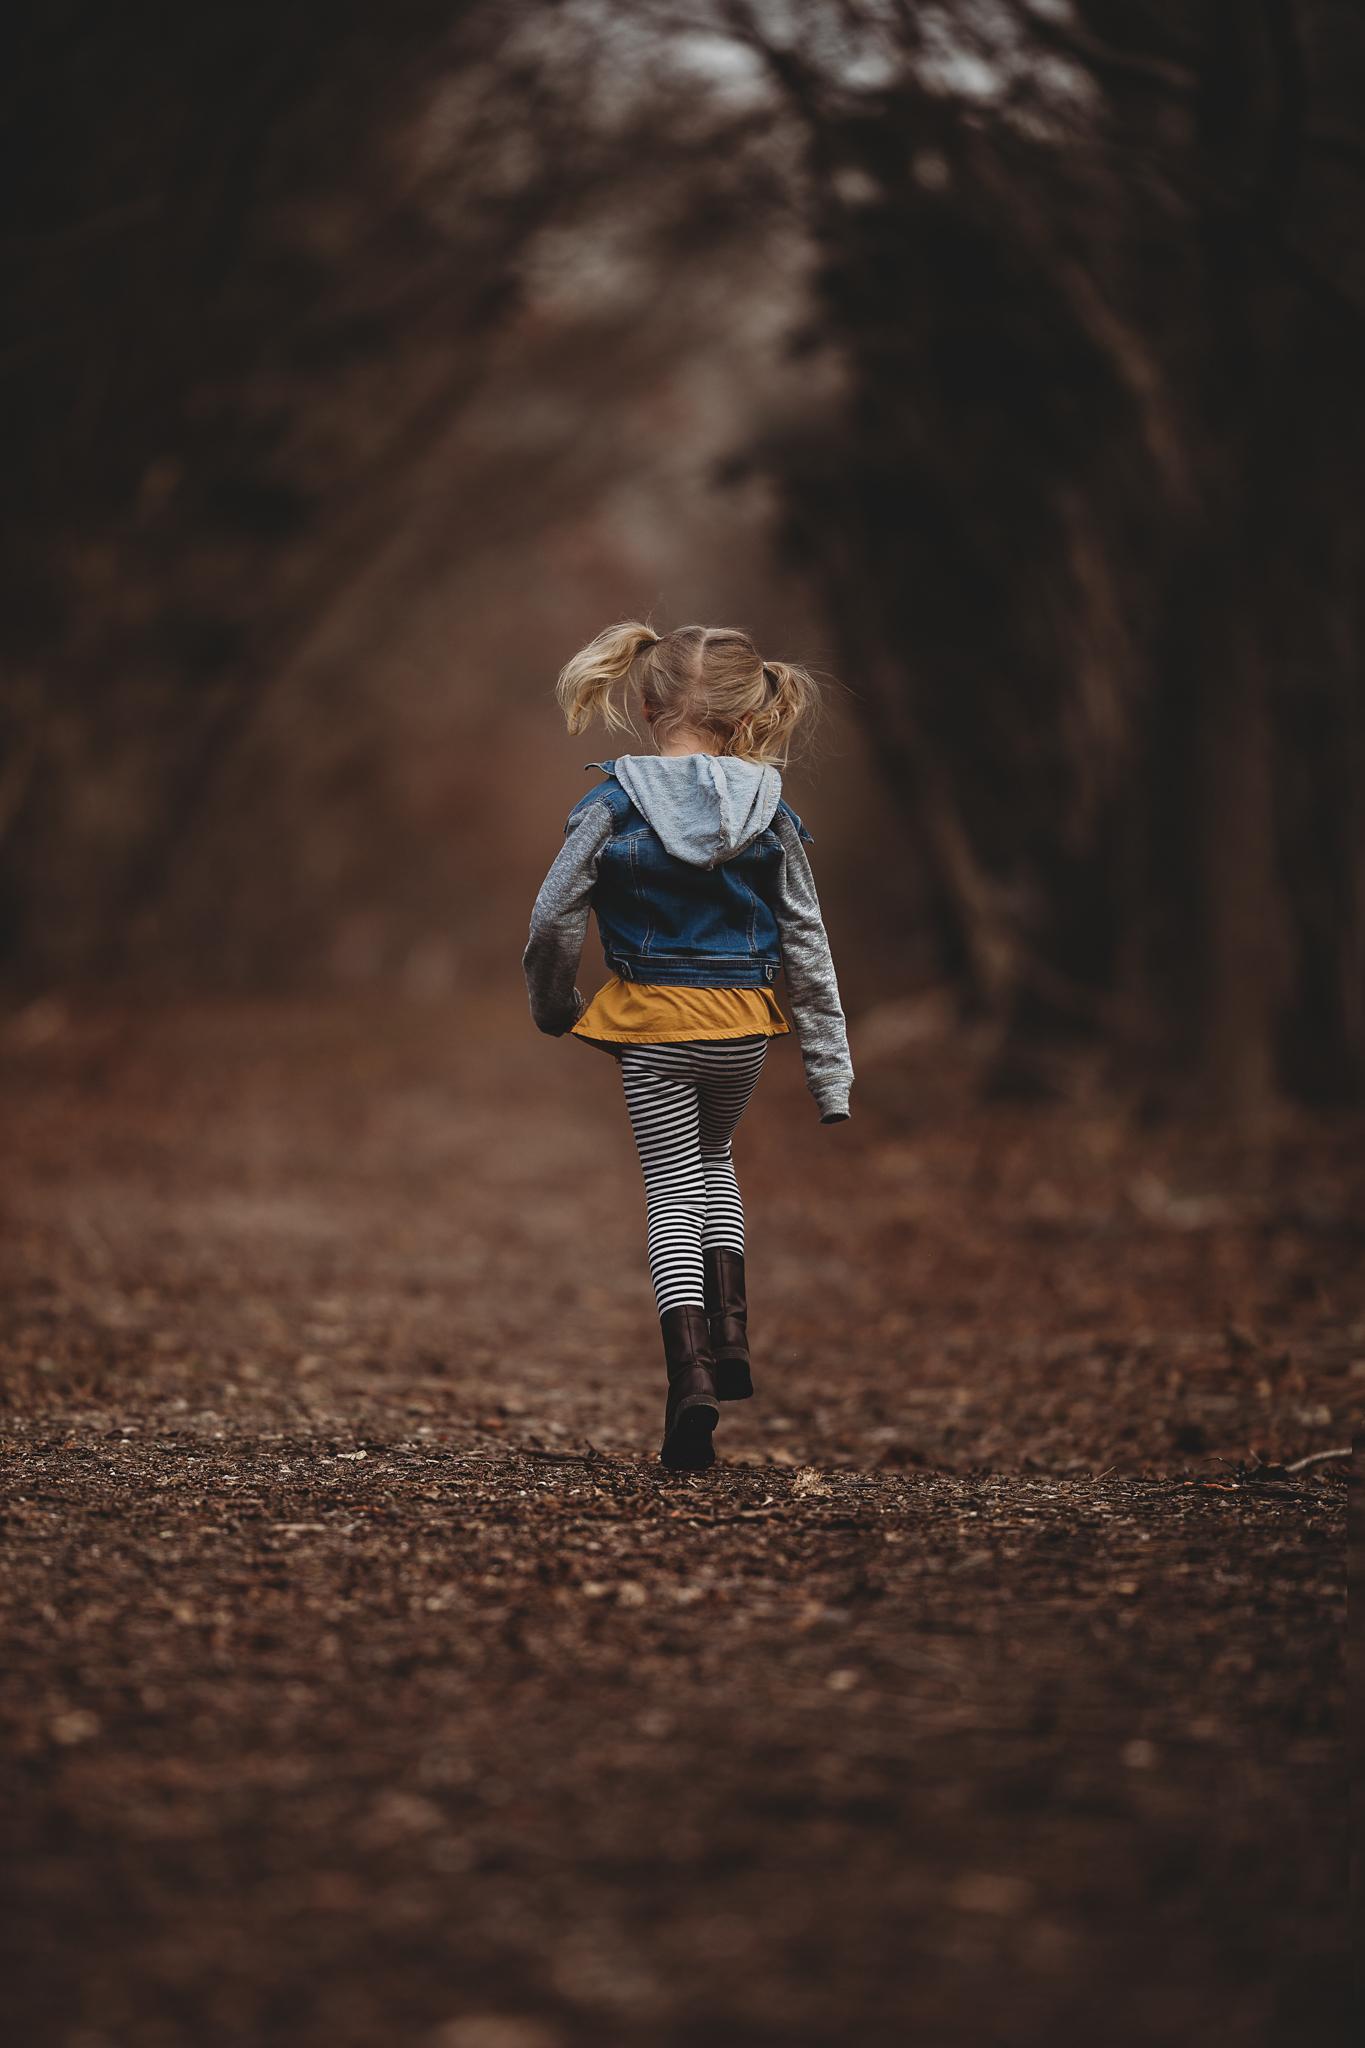 Long-island-photographer-hello-olivia-photography-children-kids-photos-new-york-lifestyle-portraits-suffolk-County-LI-47.jpg